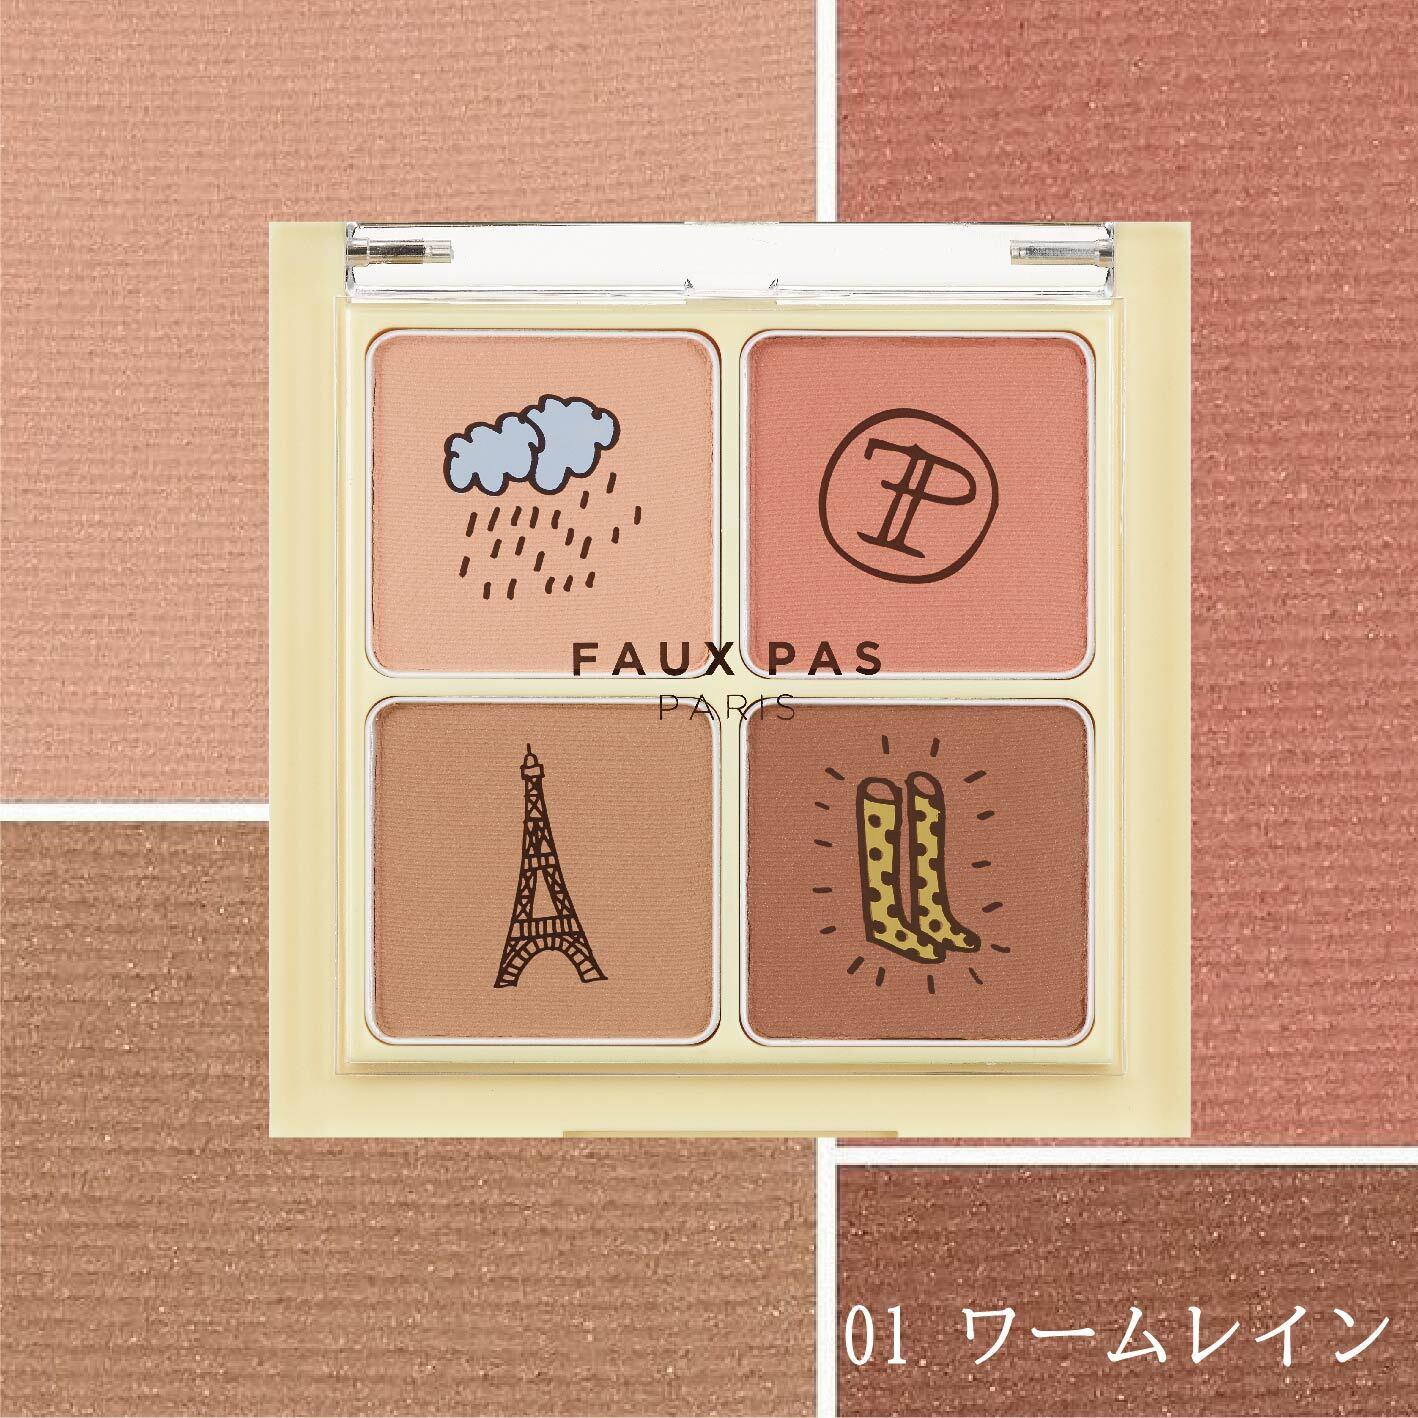 【FAUX PAS PARIS】#MOTDシャドーパレット1号 ウォームレイン【新発売】韓国コスメ ポパパリ フォーパパリ